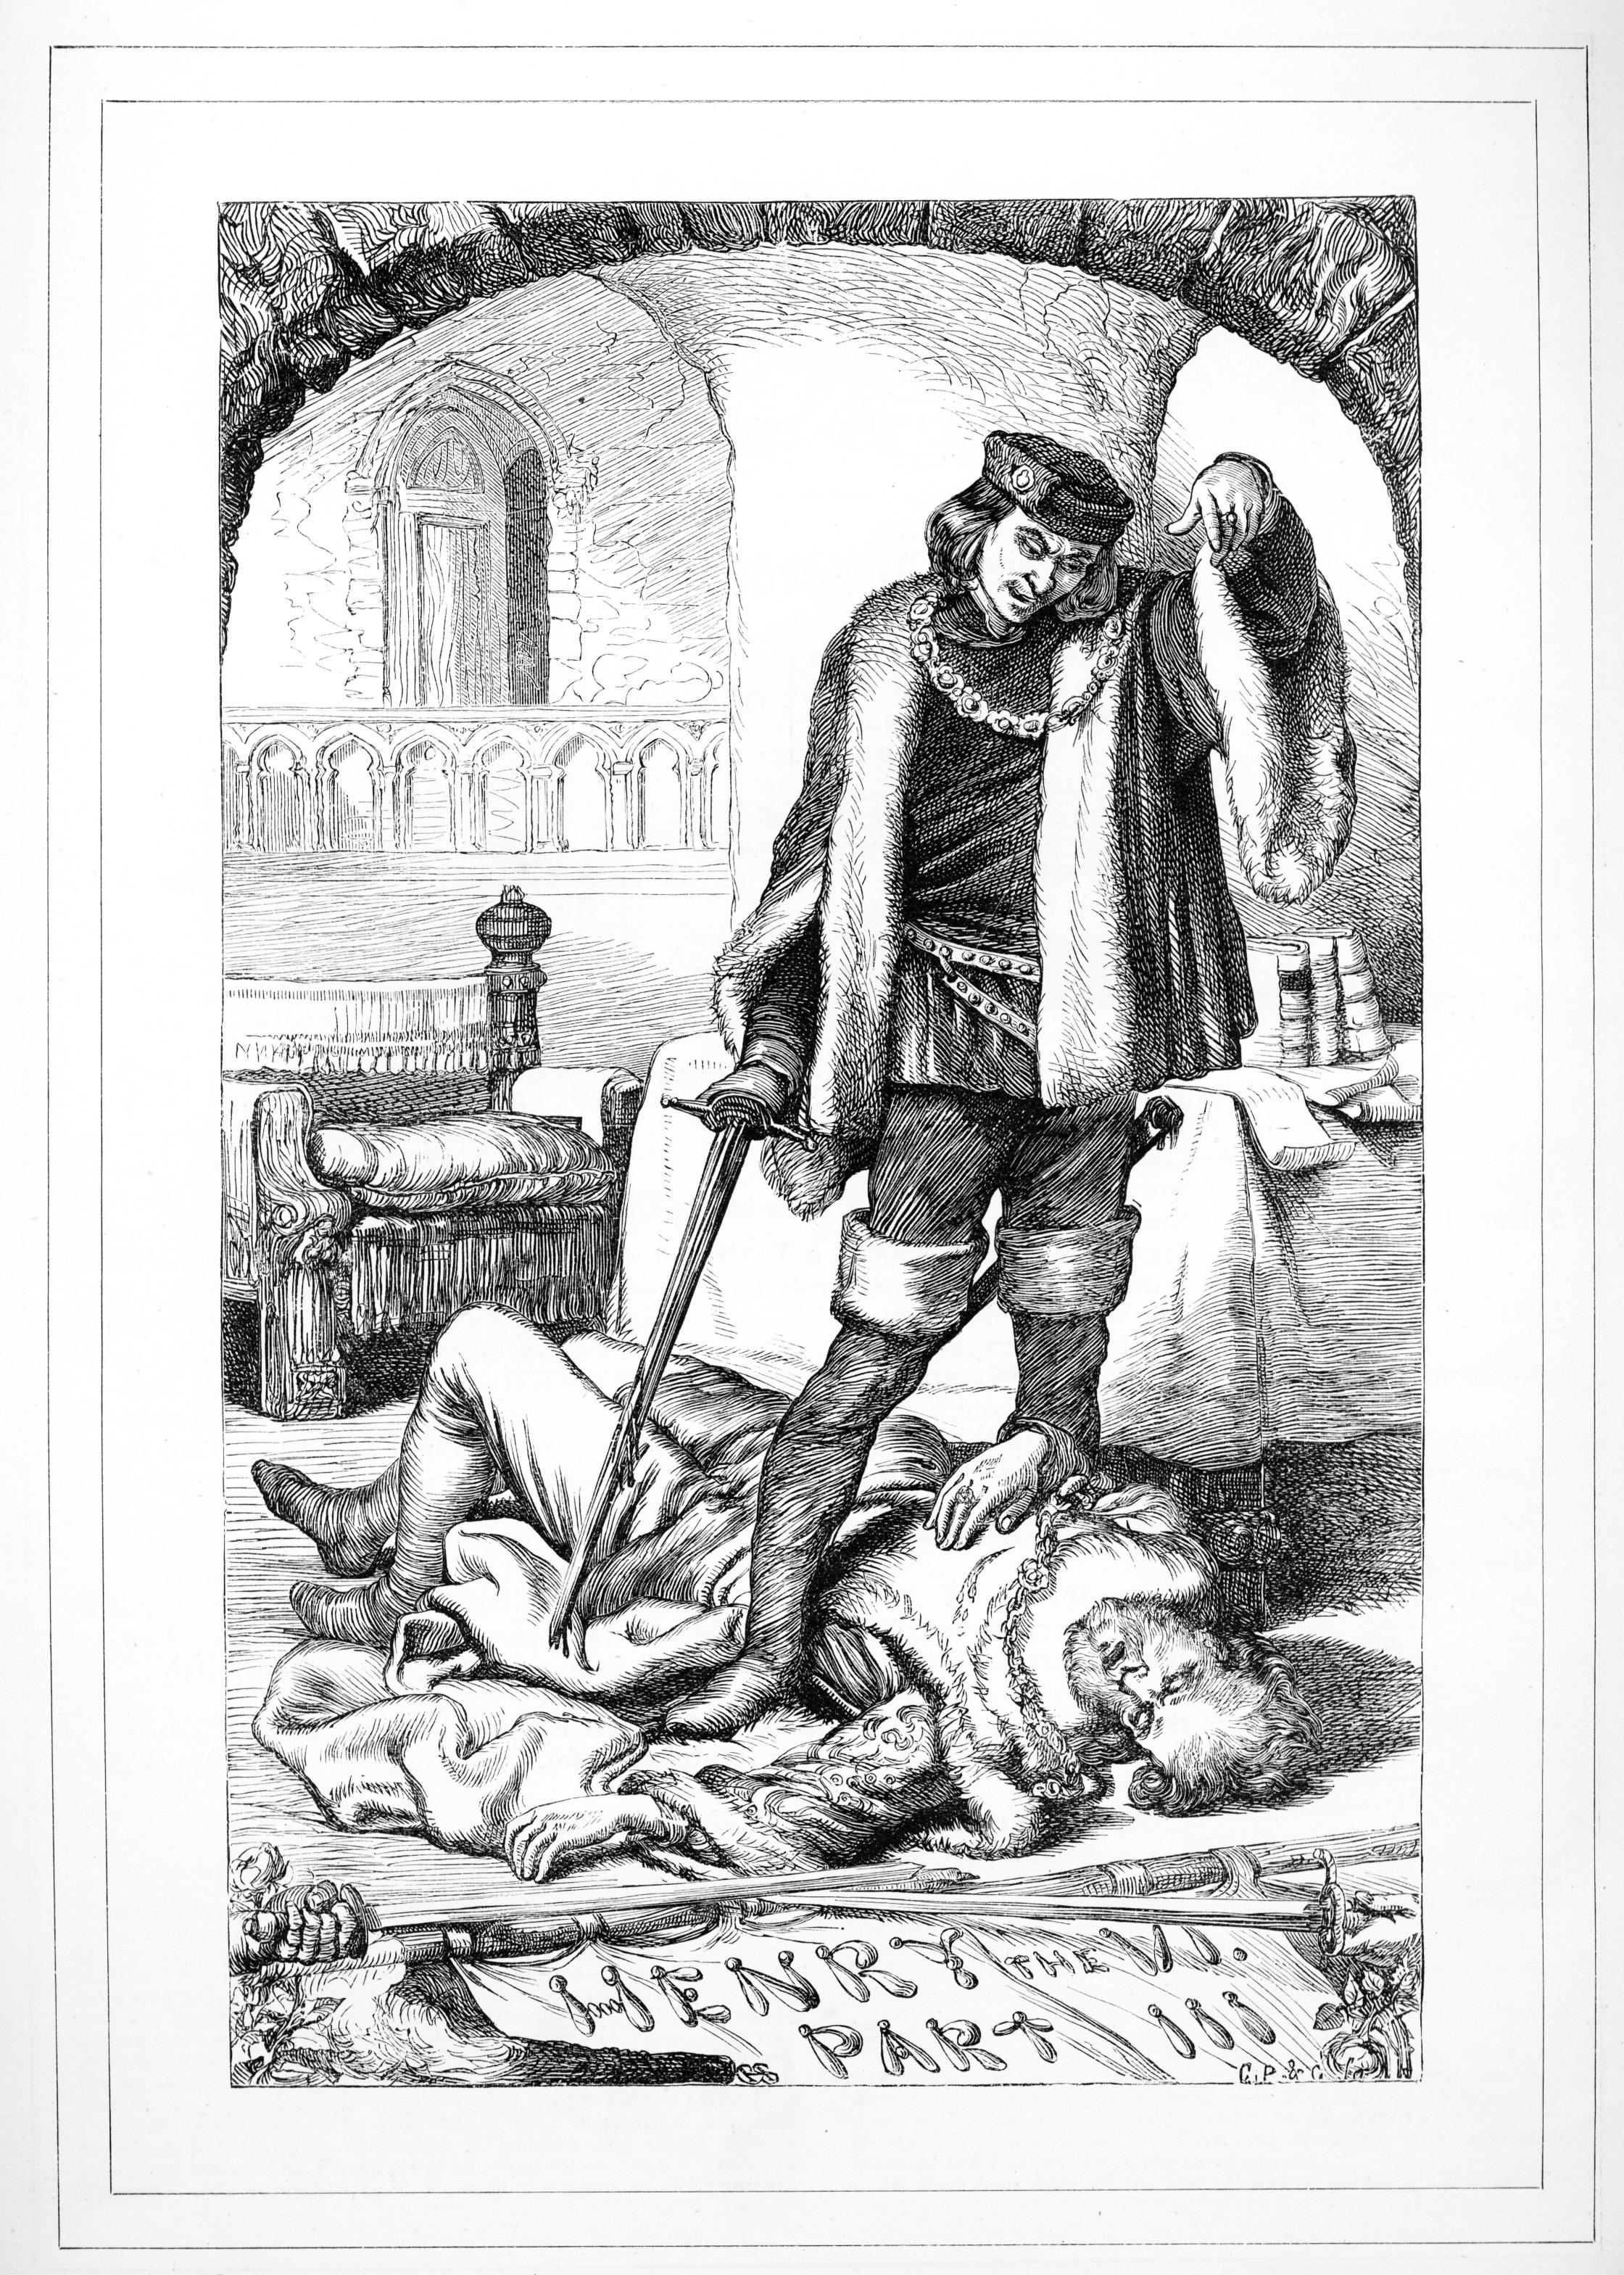 H. C. Selous, King Henry VI Part III, Illustration #1